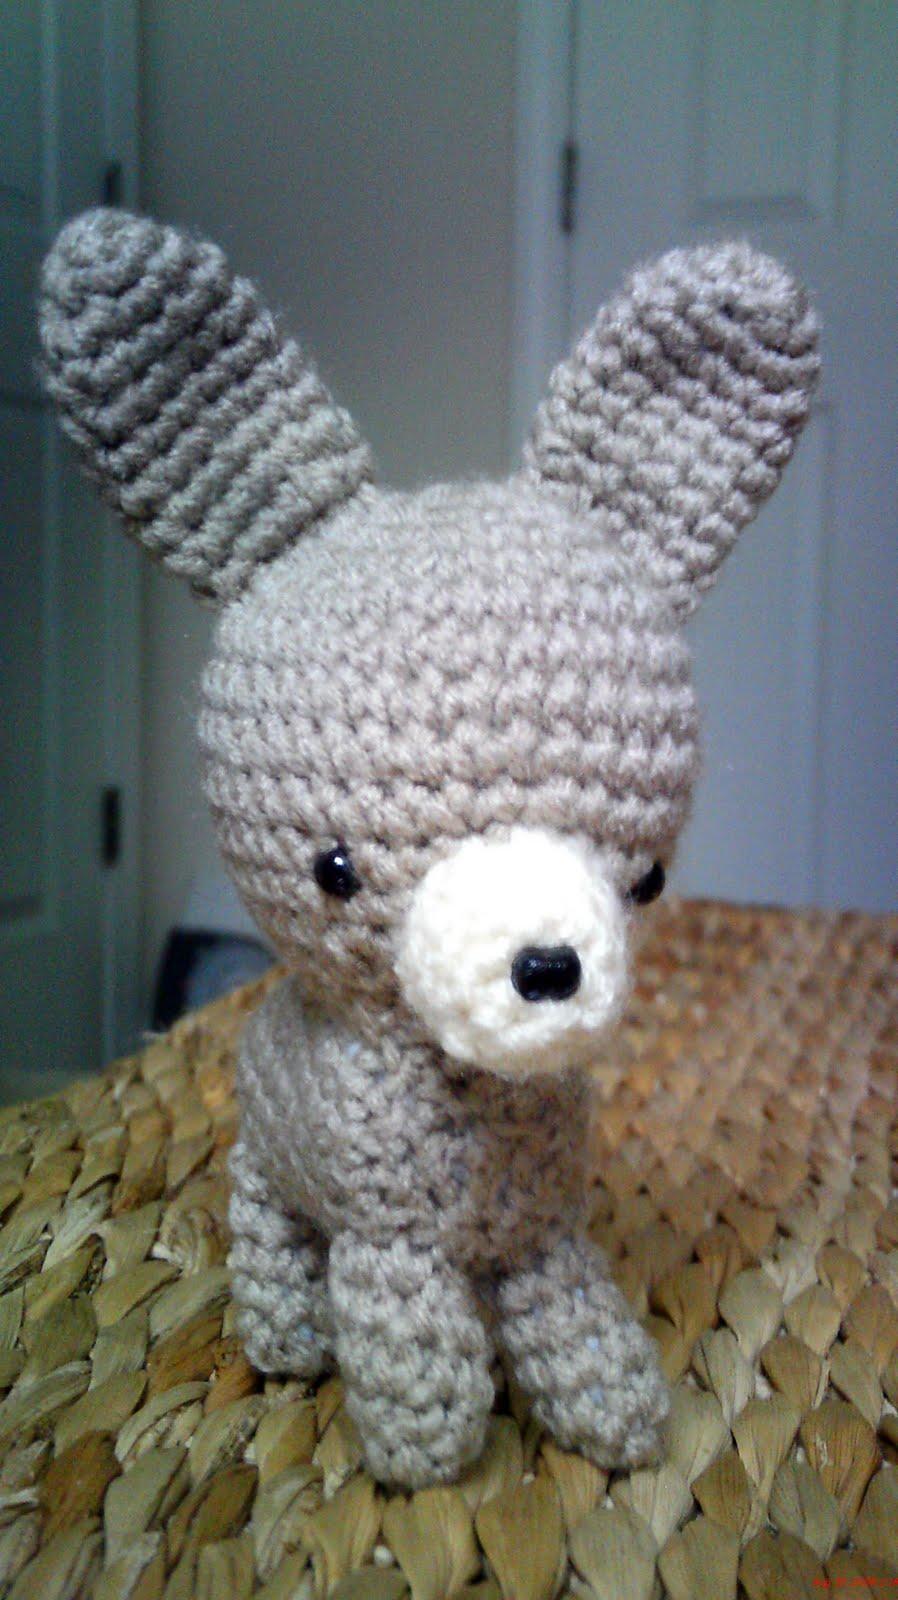 Amigurumi Chihuahua Free Pattern Curly Girls Crochet Etc.